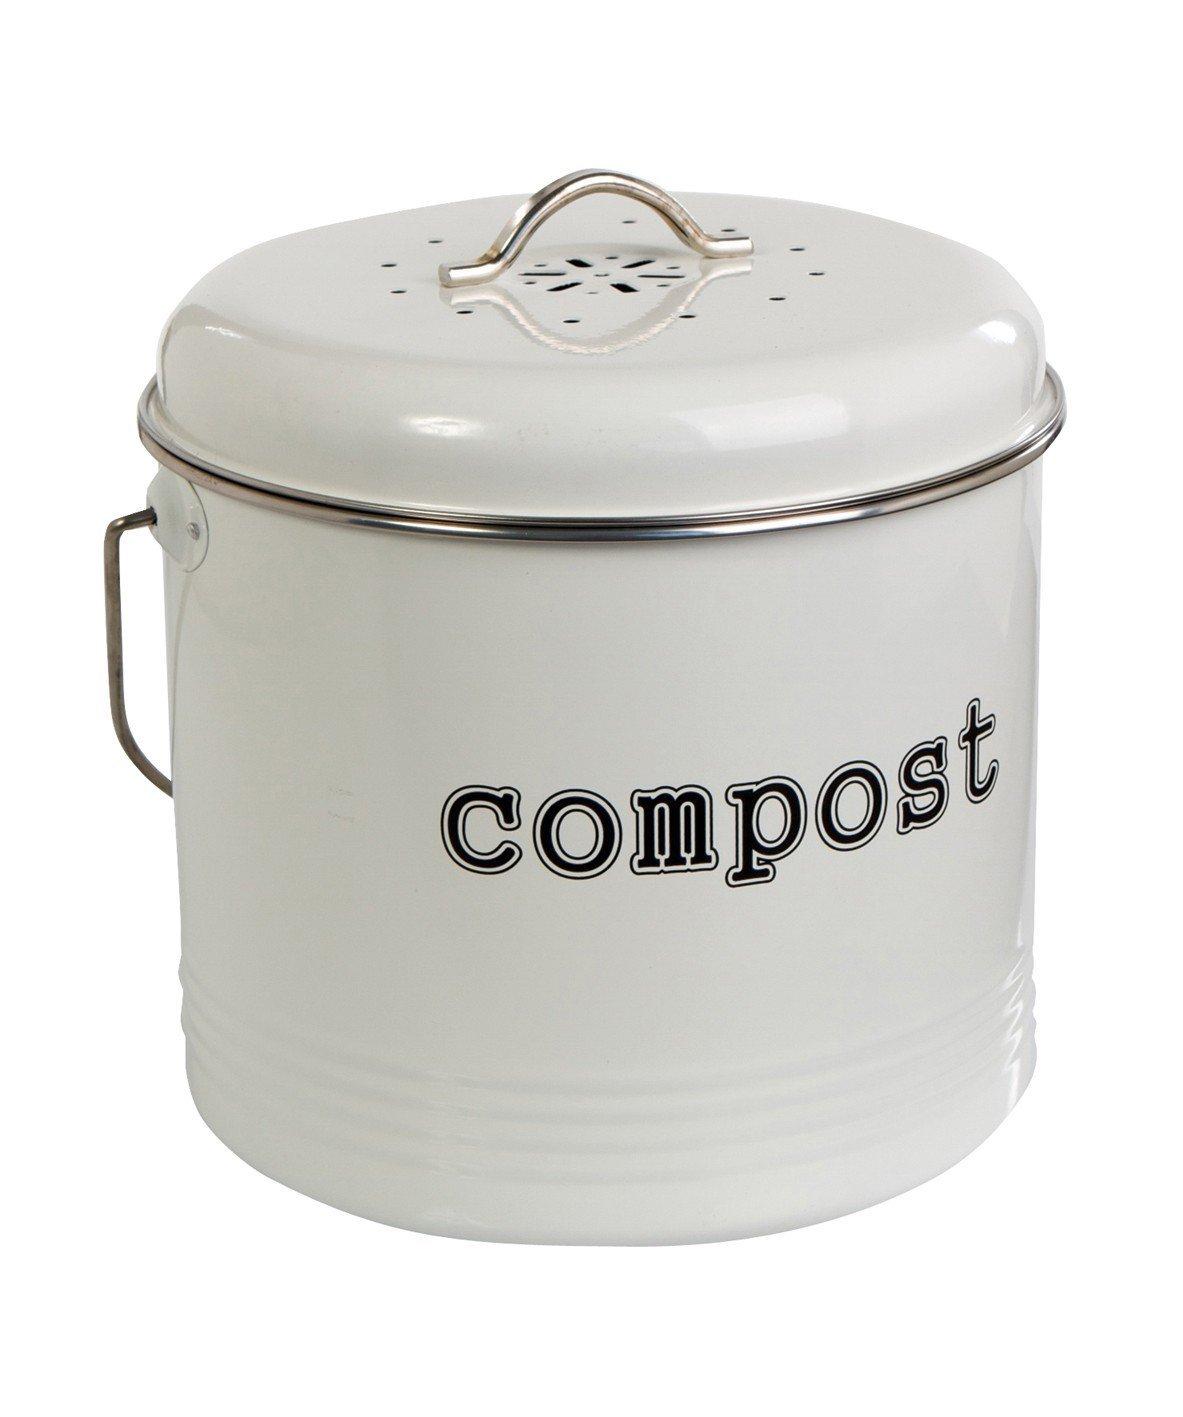 Compost Bin White At Mighty Ape Australia